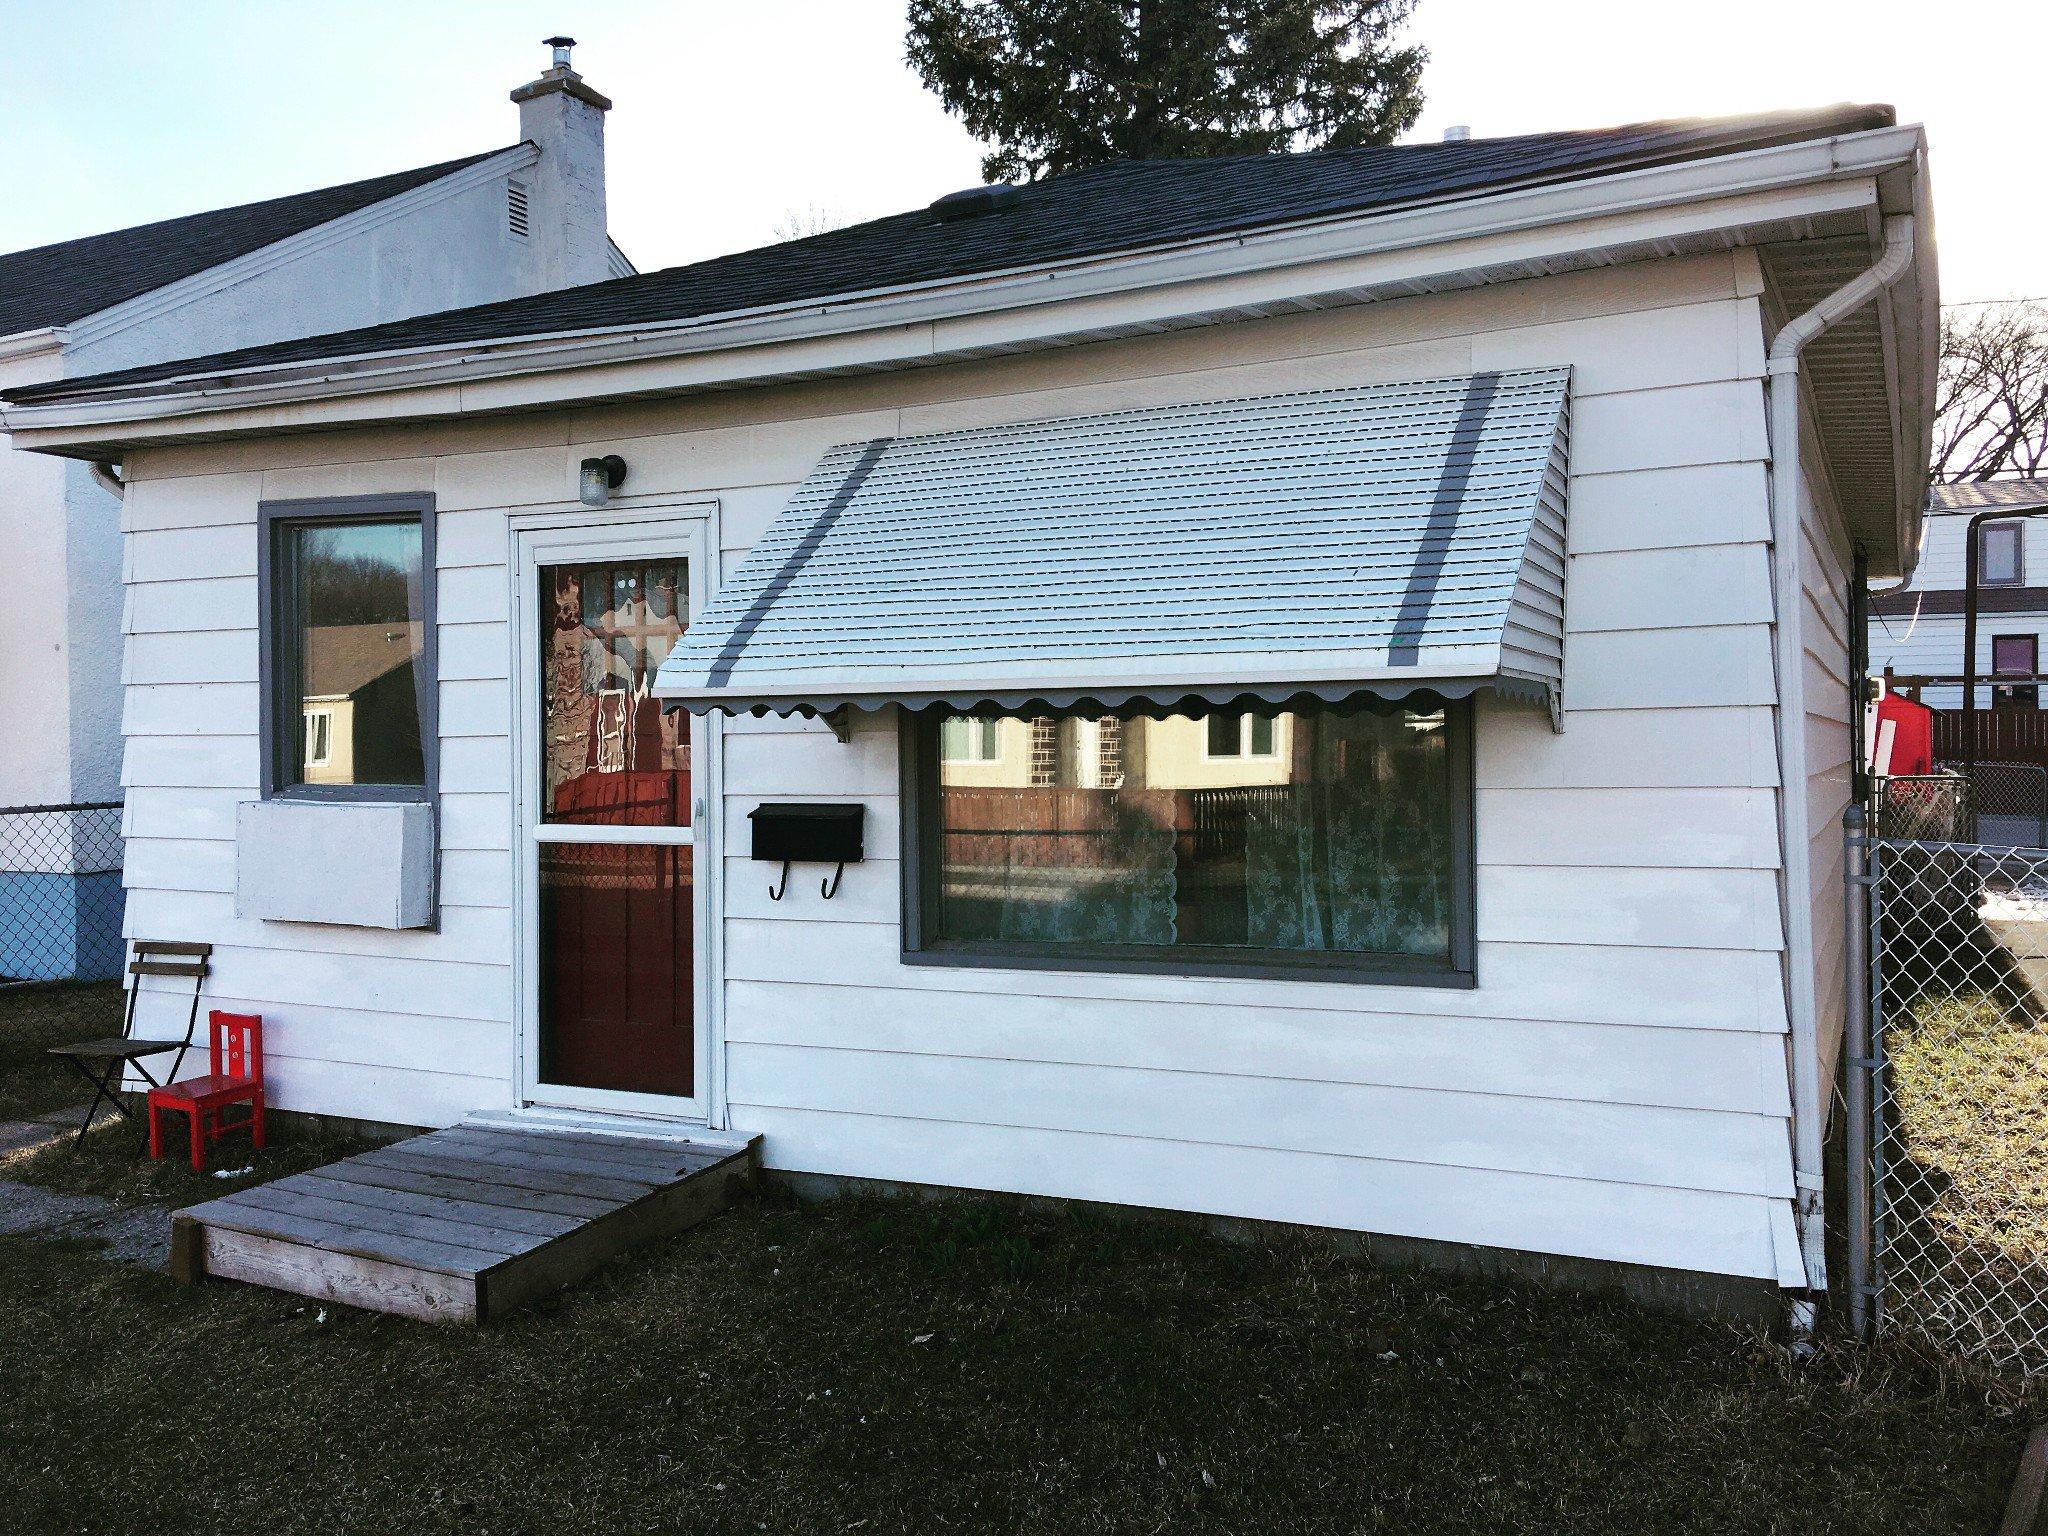 Main Photo: 1172 Valour Road in Winnipeg: Sargent Park Single Family Detached for sale (5C)  : MLS®# 1810002